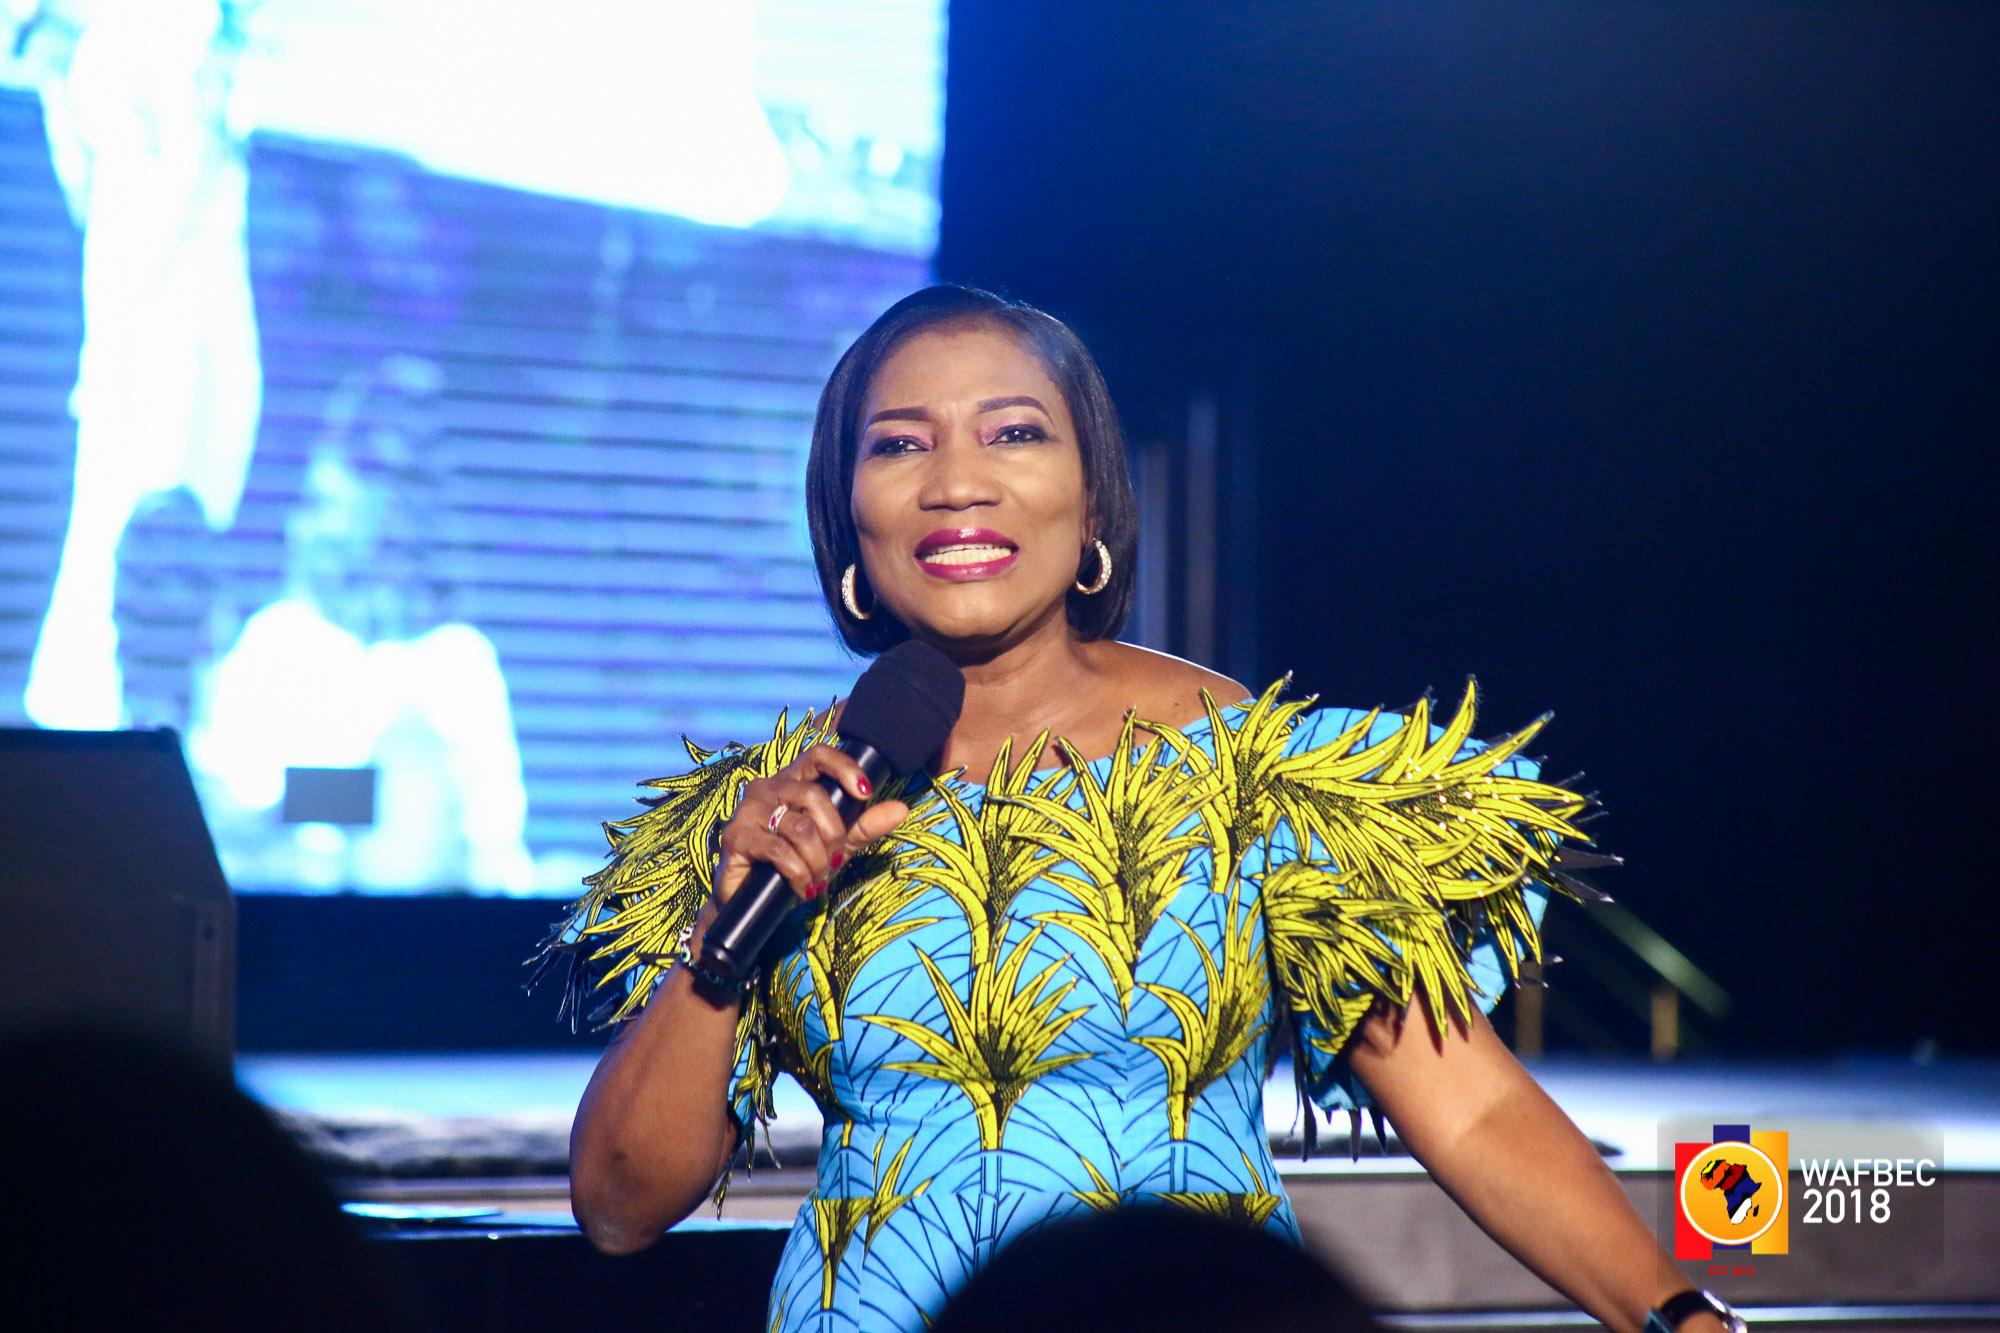 WAFBEC 2018 – Day 2 (Morning Session 3) with Rev. (Mrs) Funke Felix-Adejumo